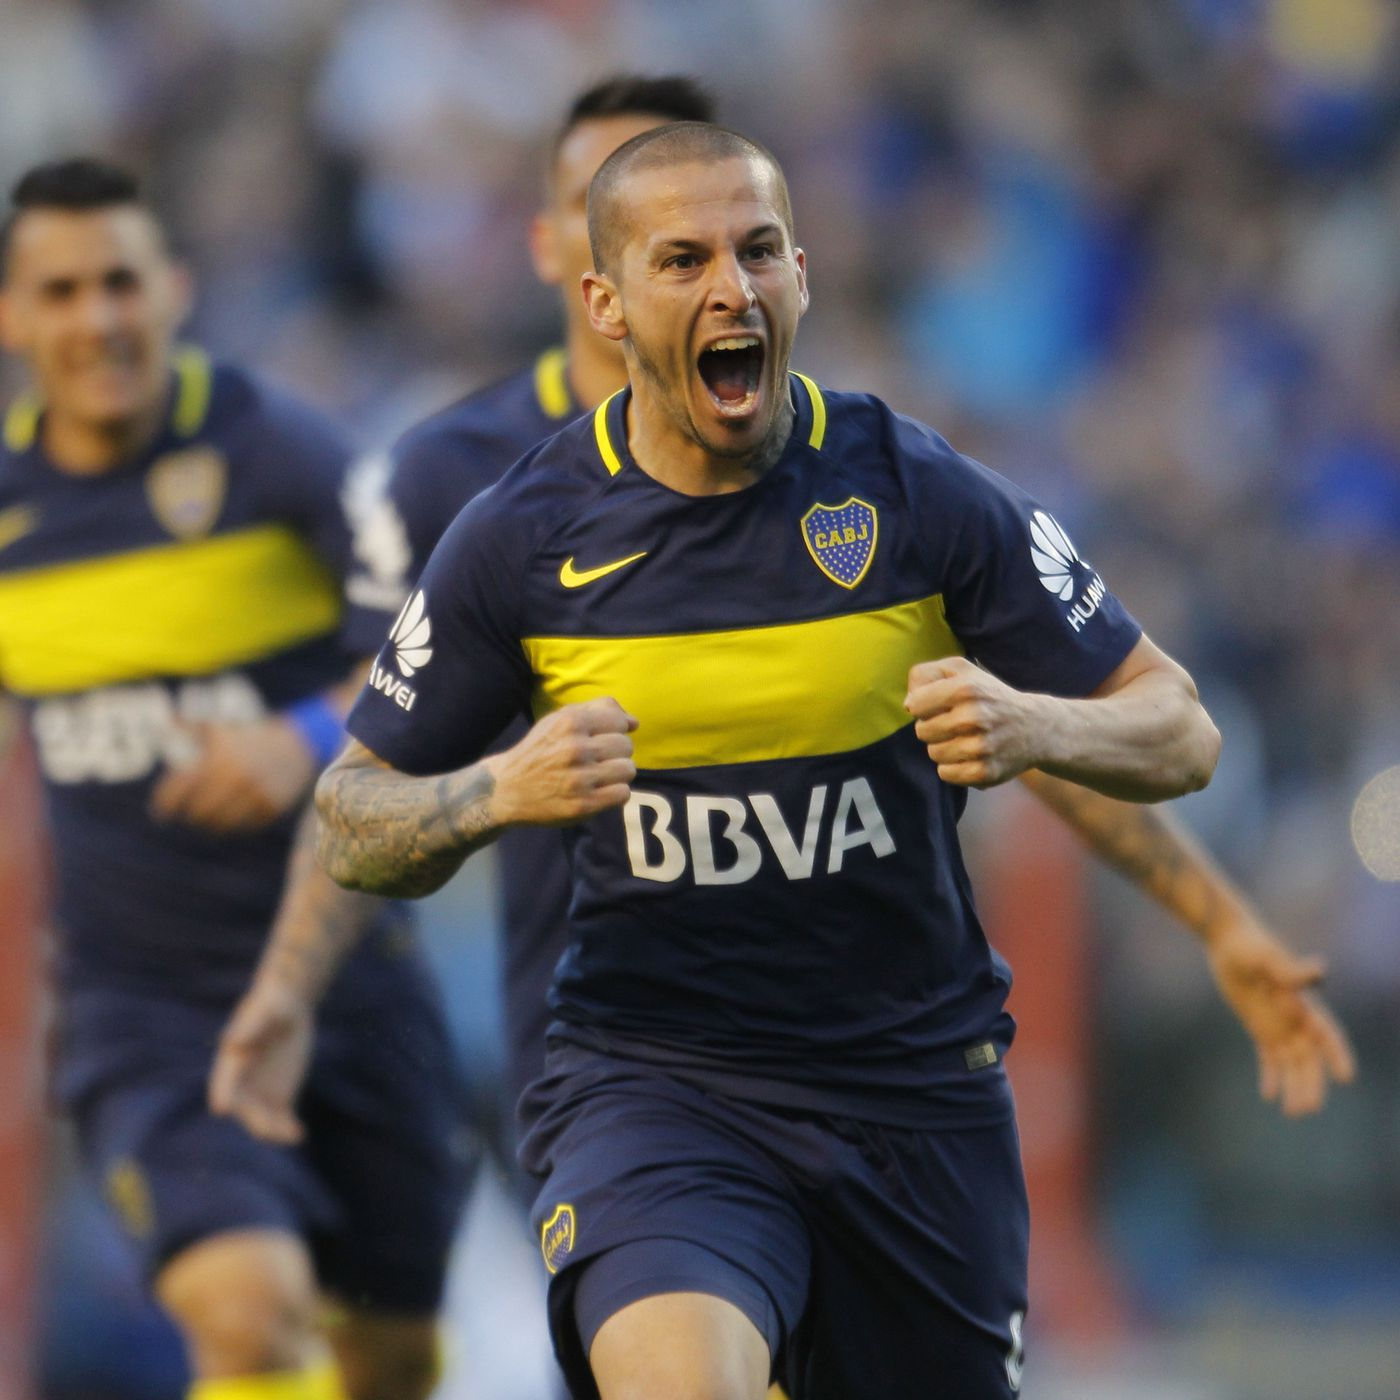 sports shoes 89b4a 89f07 Sounders making record bid for Boca Juniors' Dario Benedetto ...